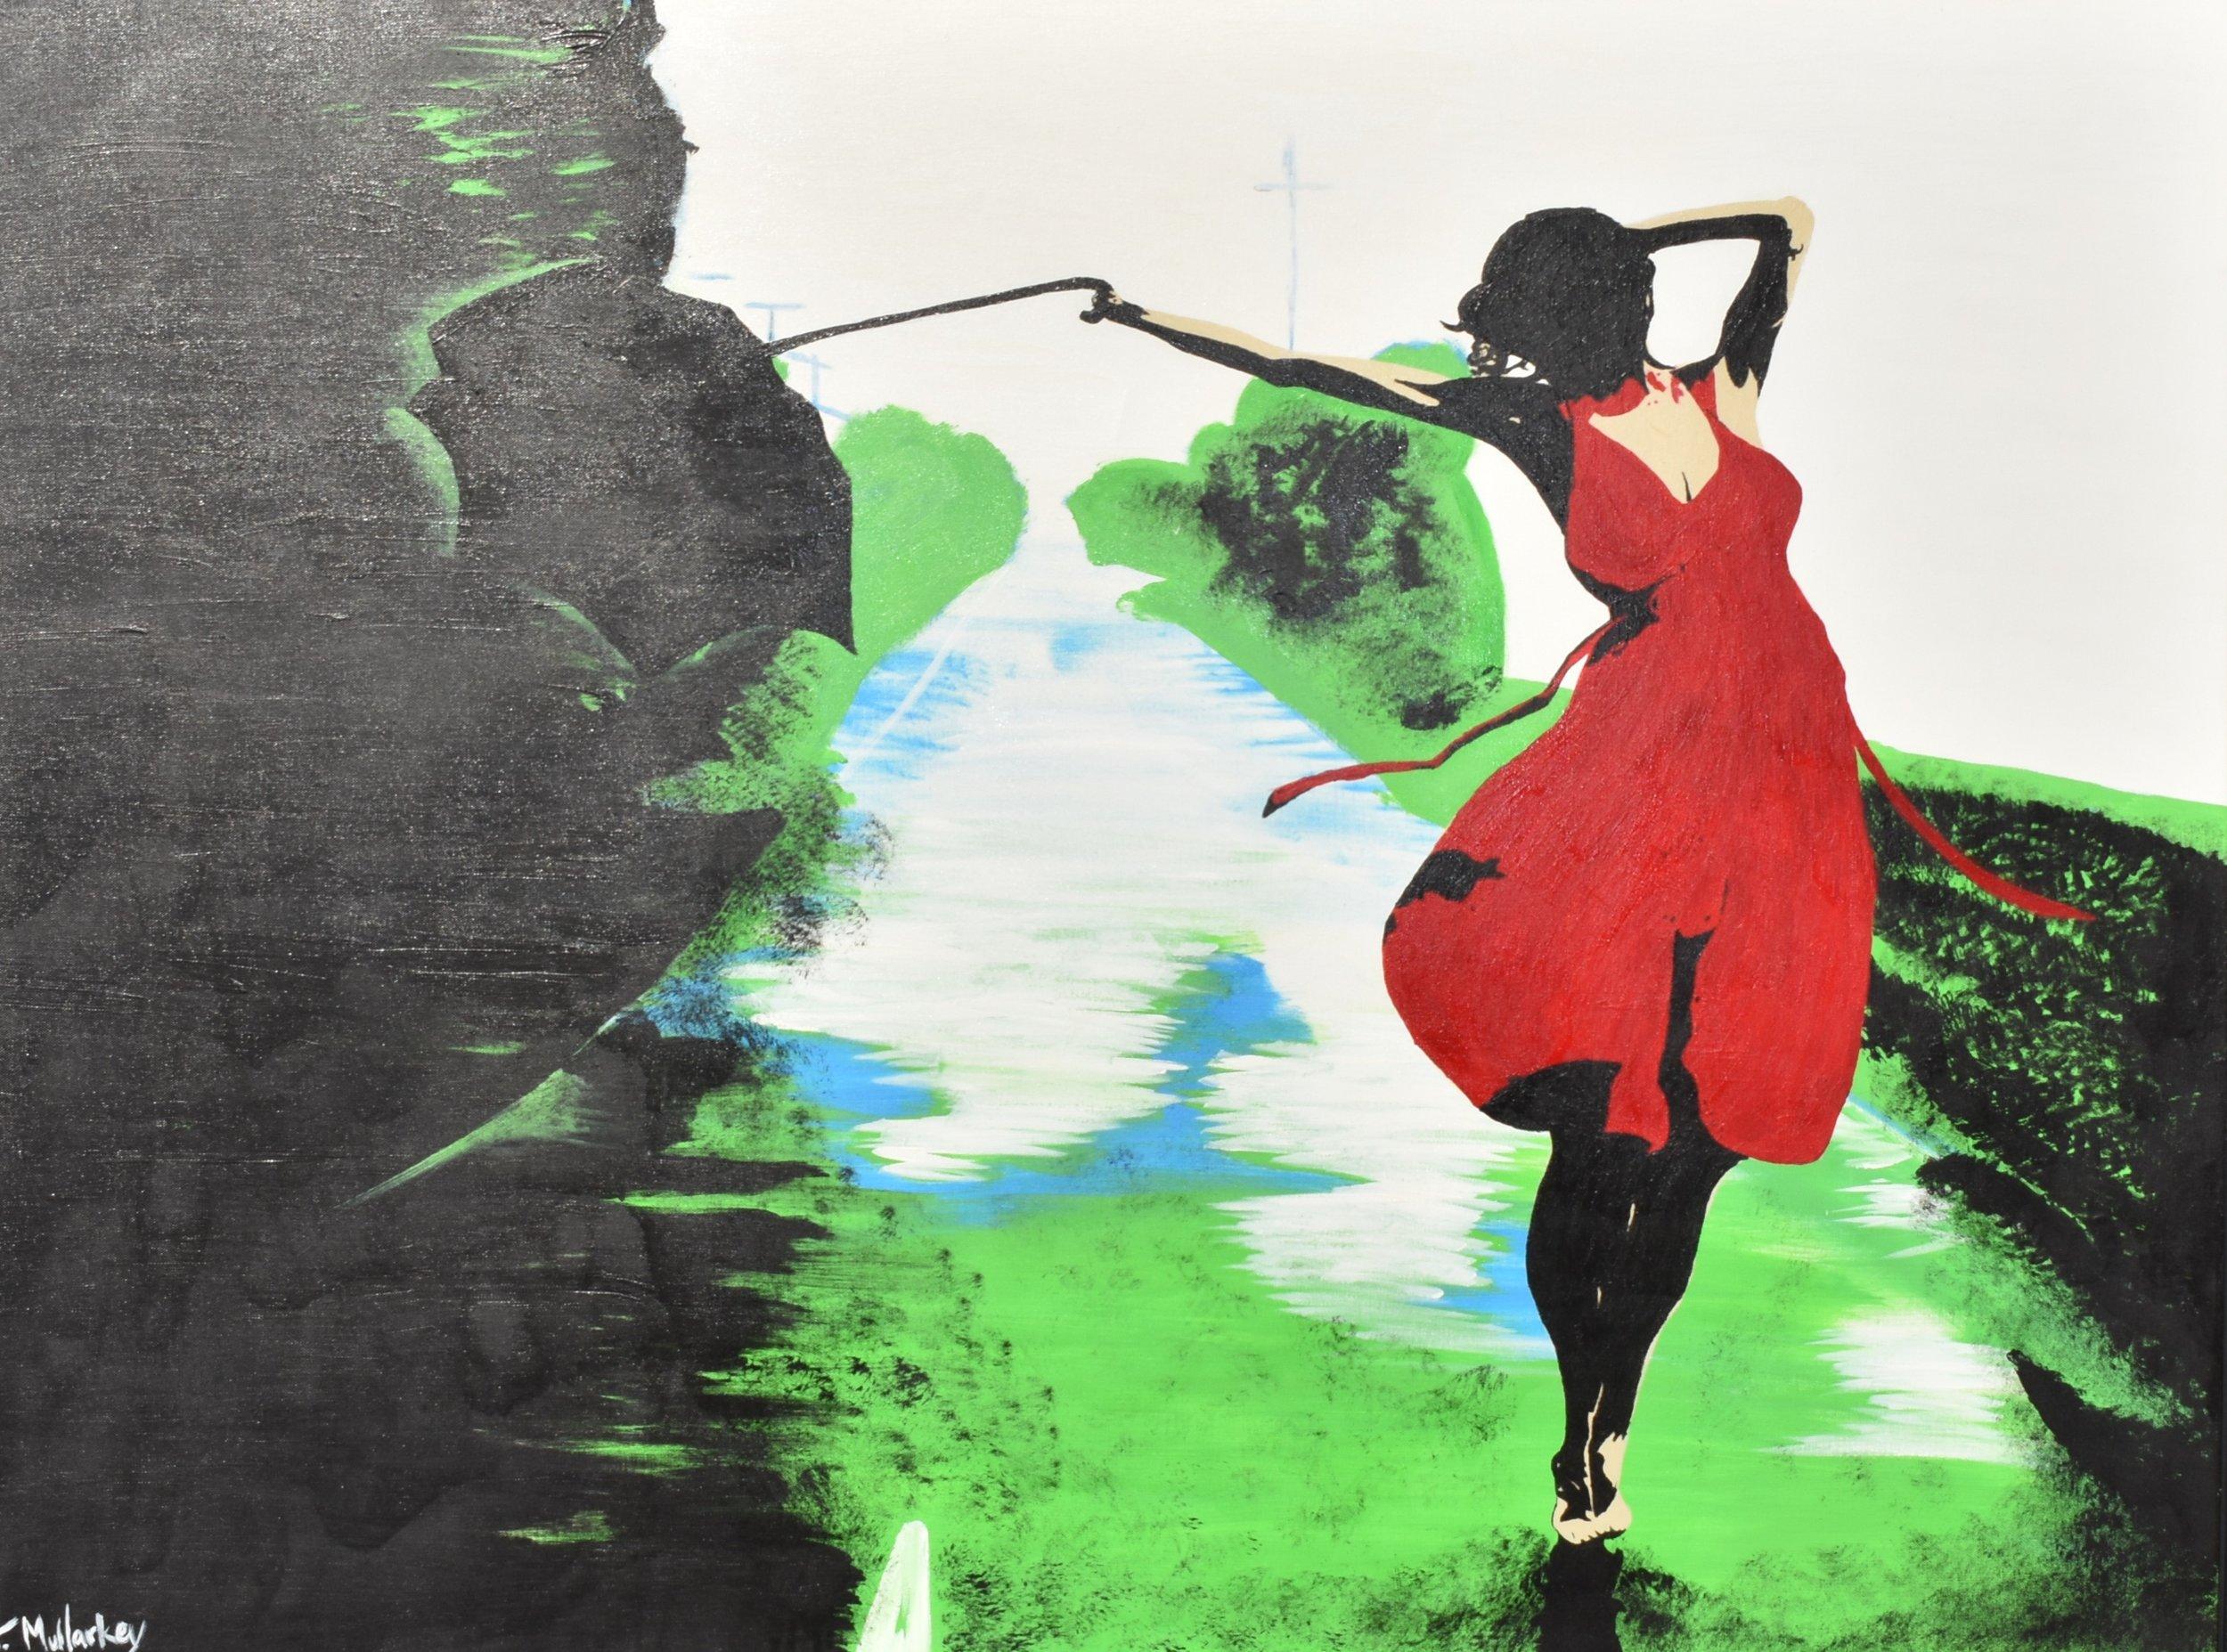 Here comes the rain again , 2013  Acrylic on canvas  36 × 48 in  91.4 × 121.9 cm   Inquire